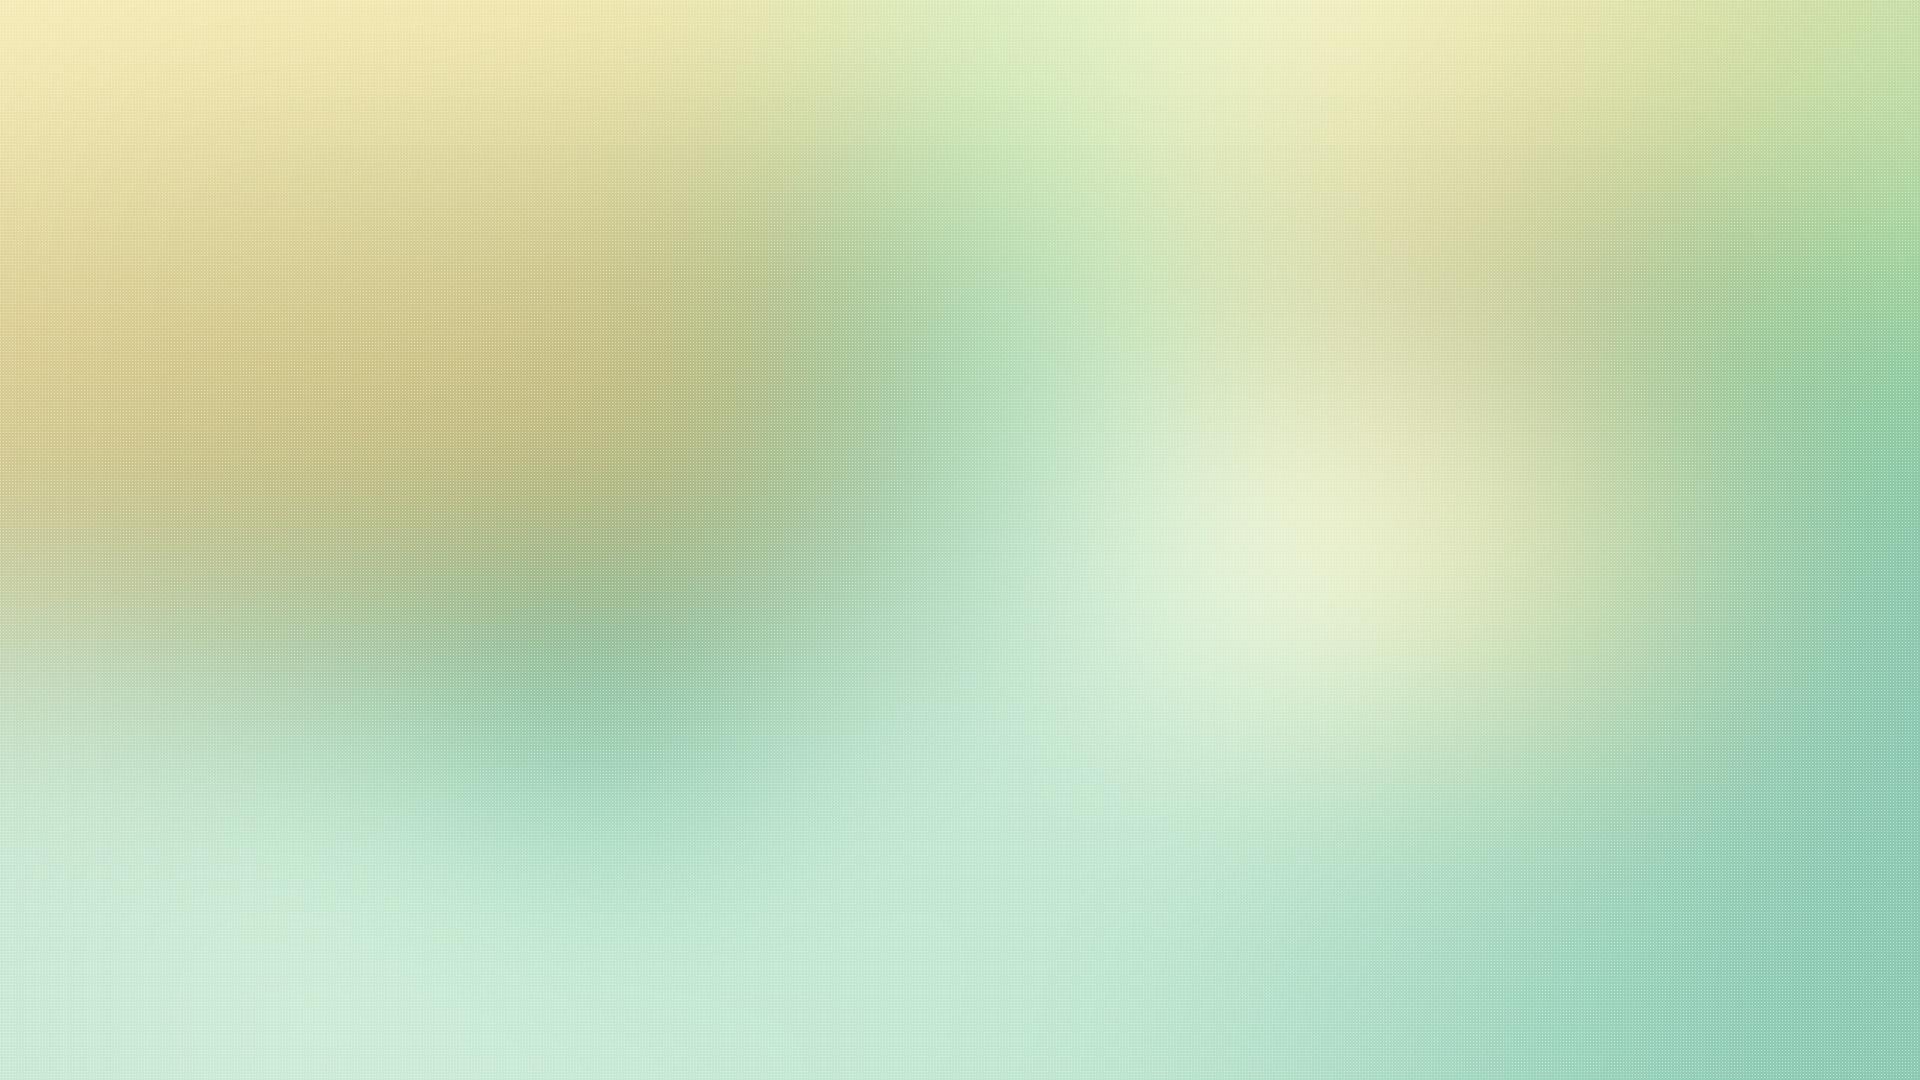 Elegant_Background-2